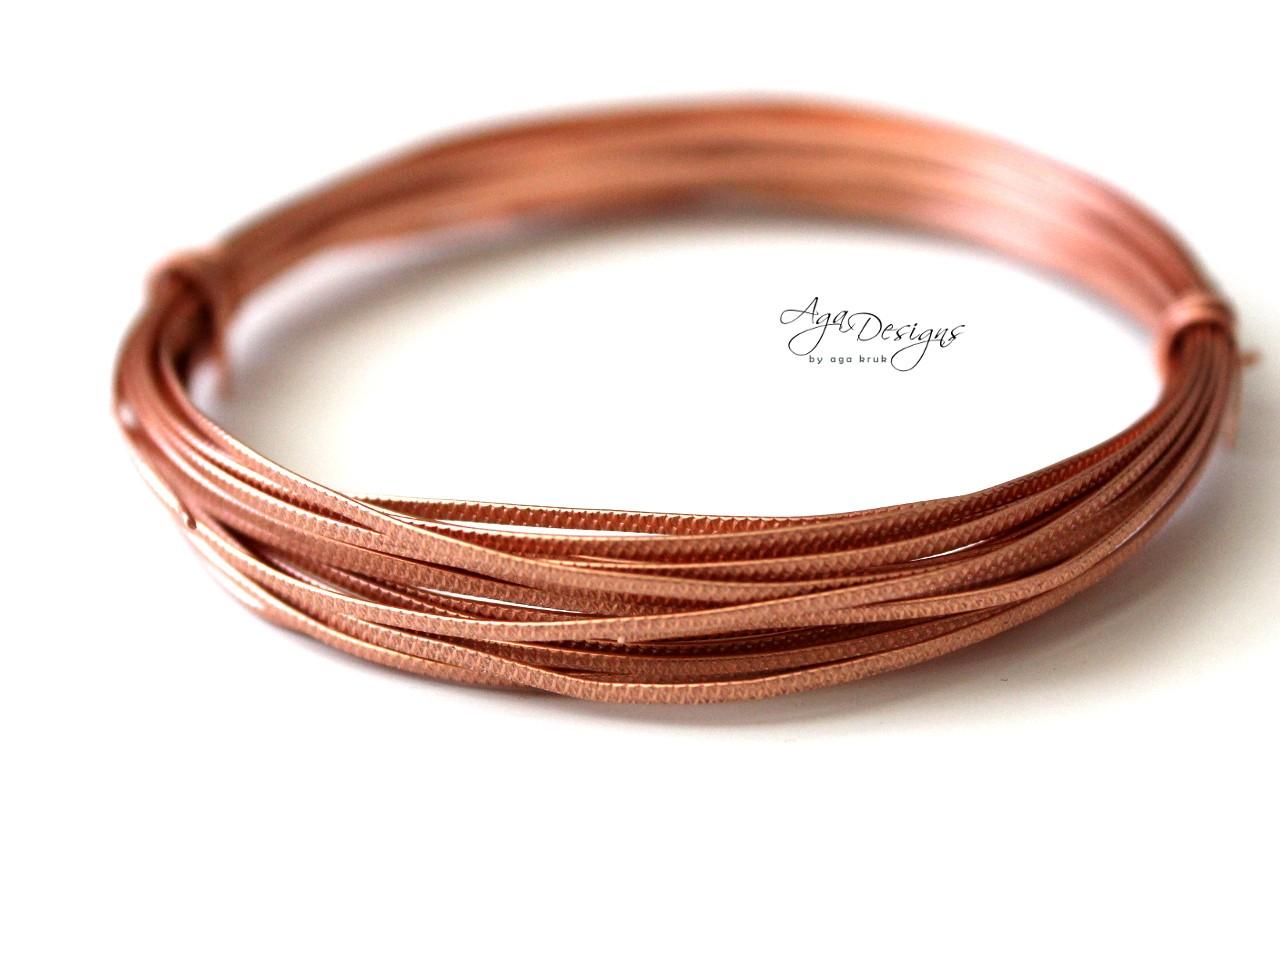 Copper Texture Wire - 20 gauge